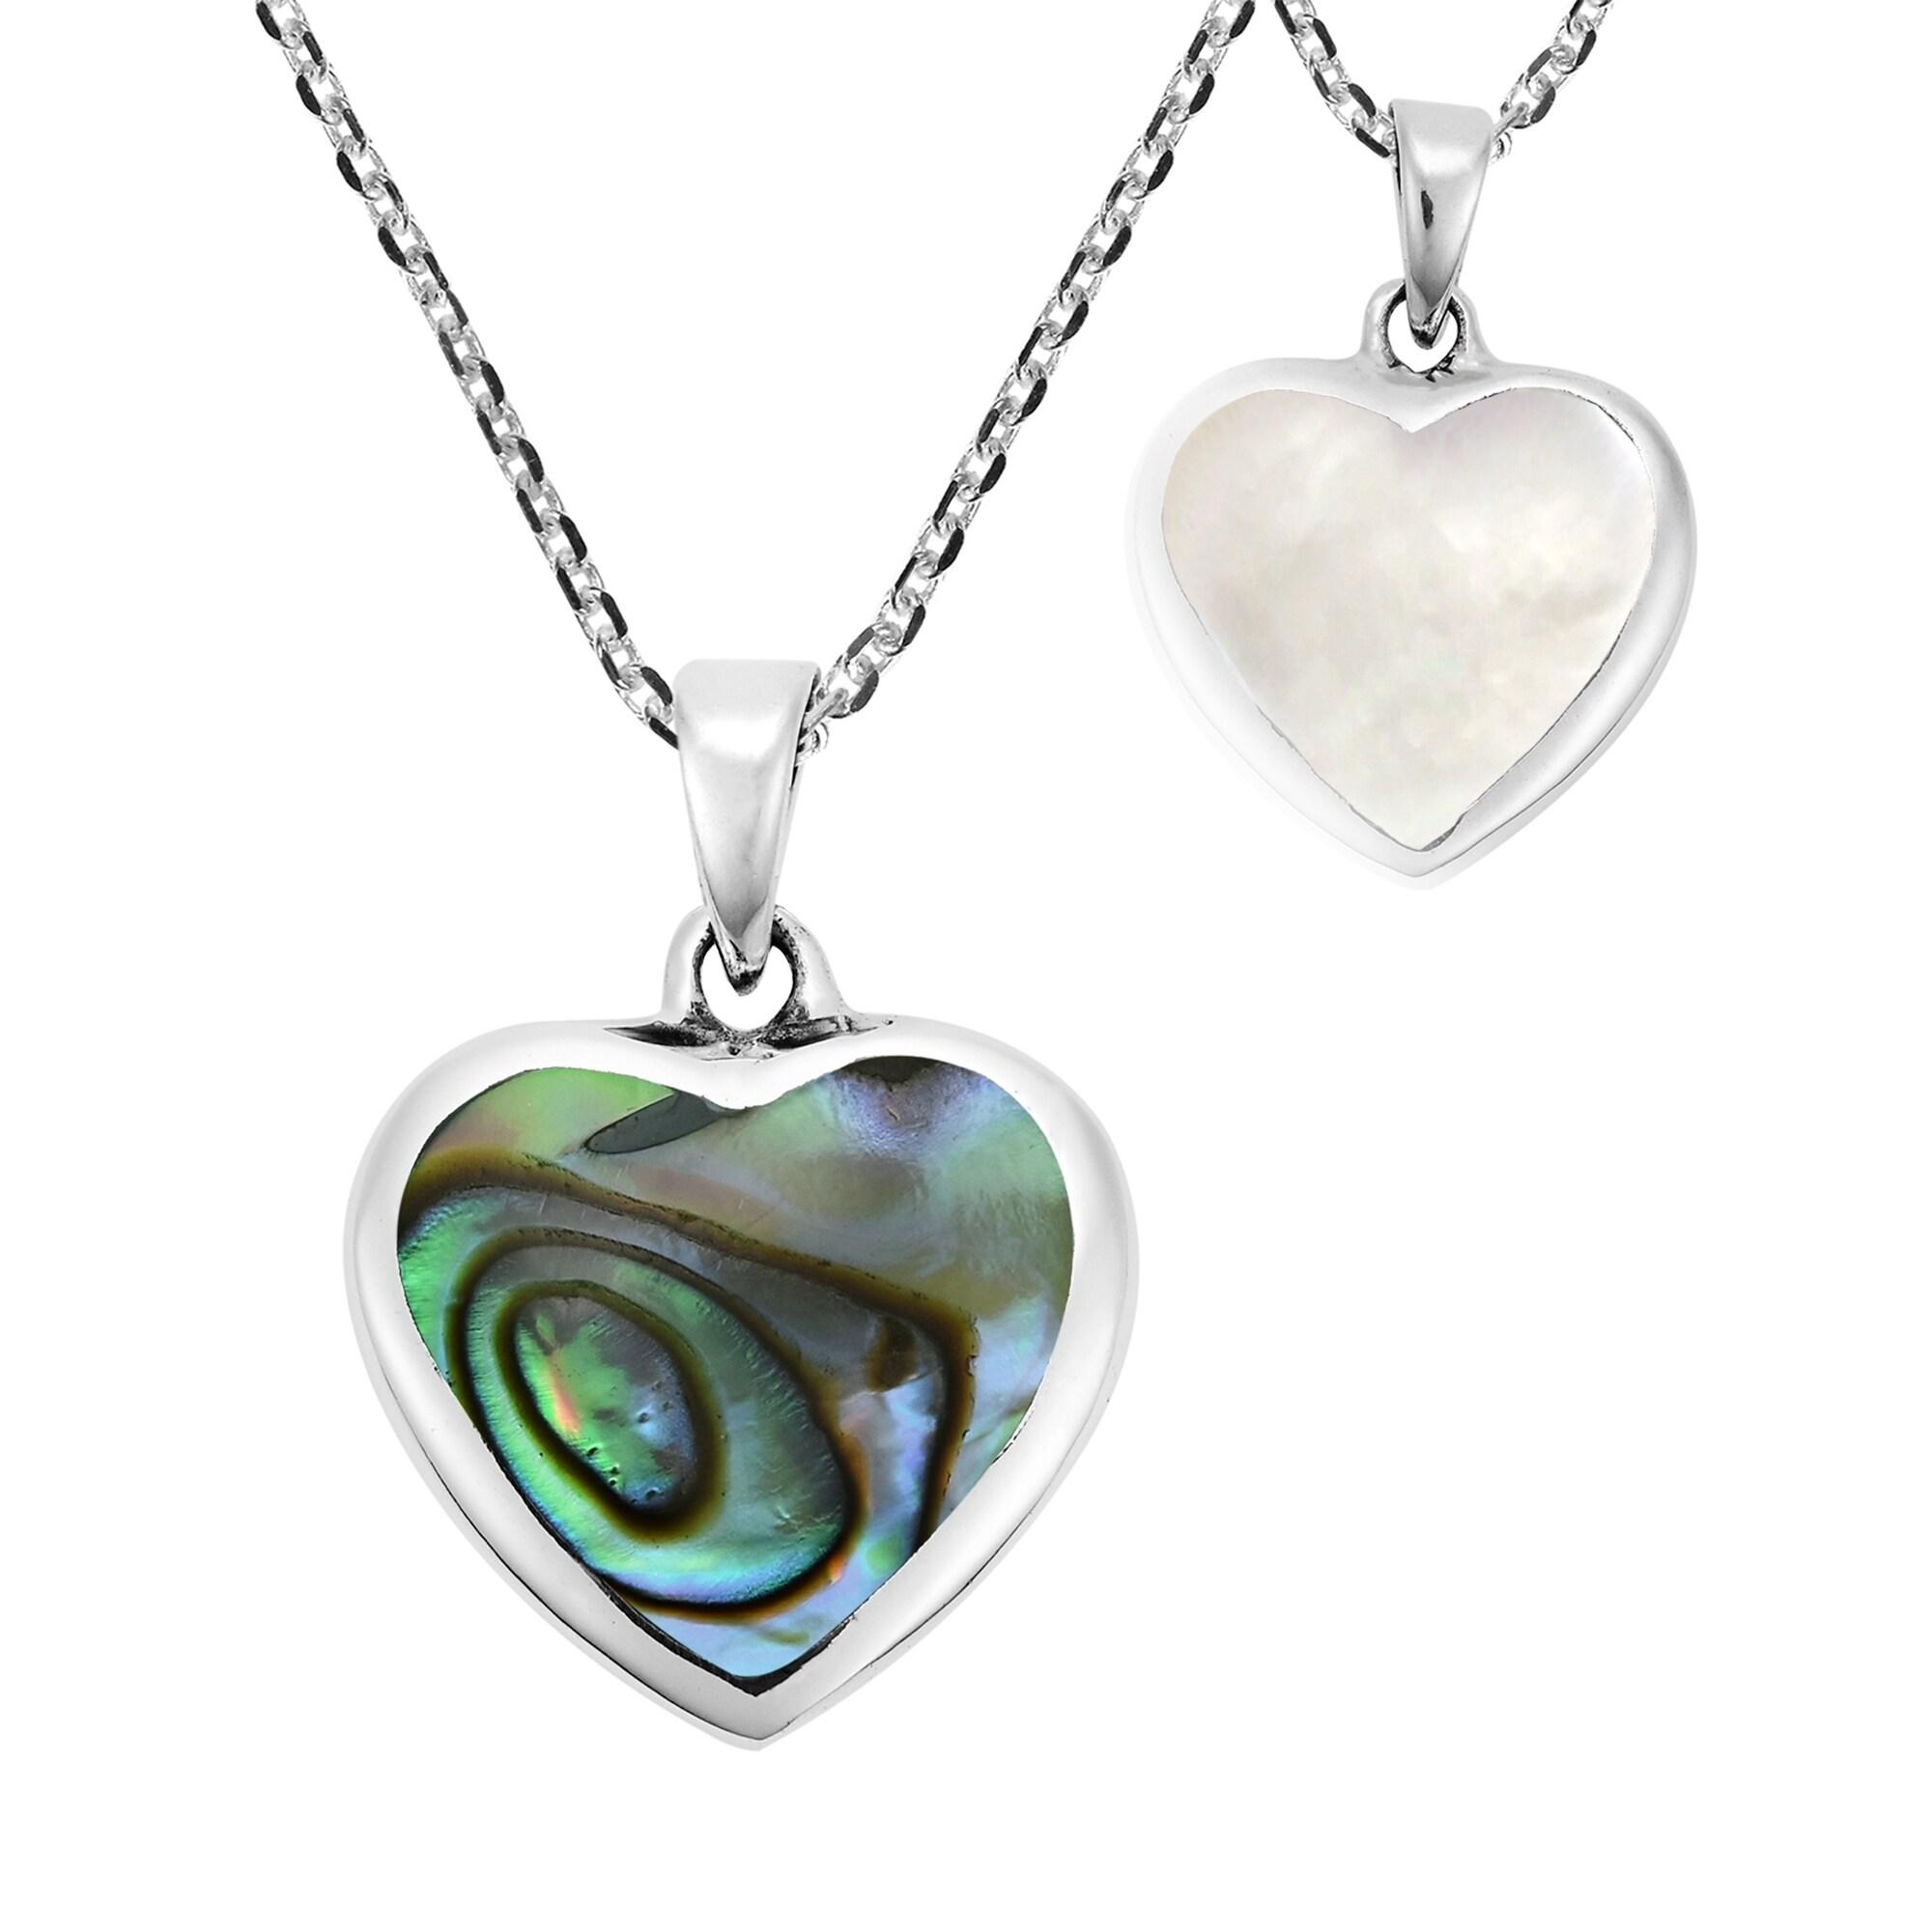 Clever .925 Sterling Silver Floral Heart Locket Charm Pendant Msrp $128 Fancy Colours Fine Necklaces & Pendants